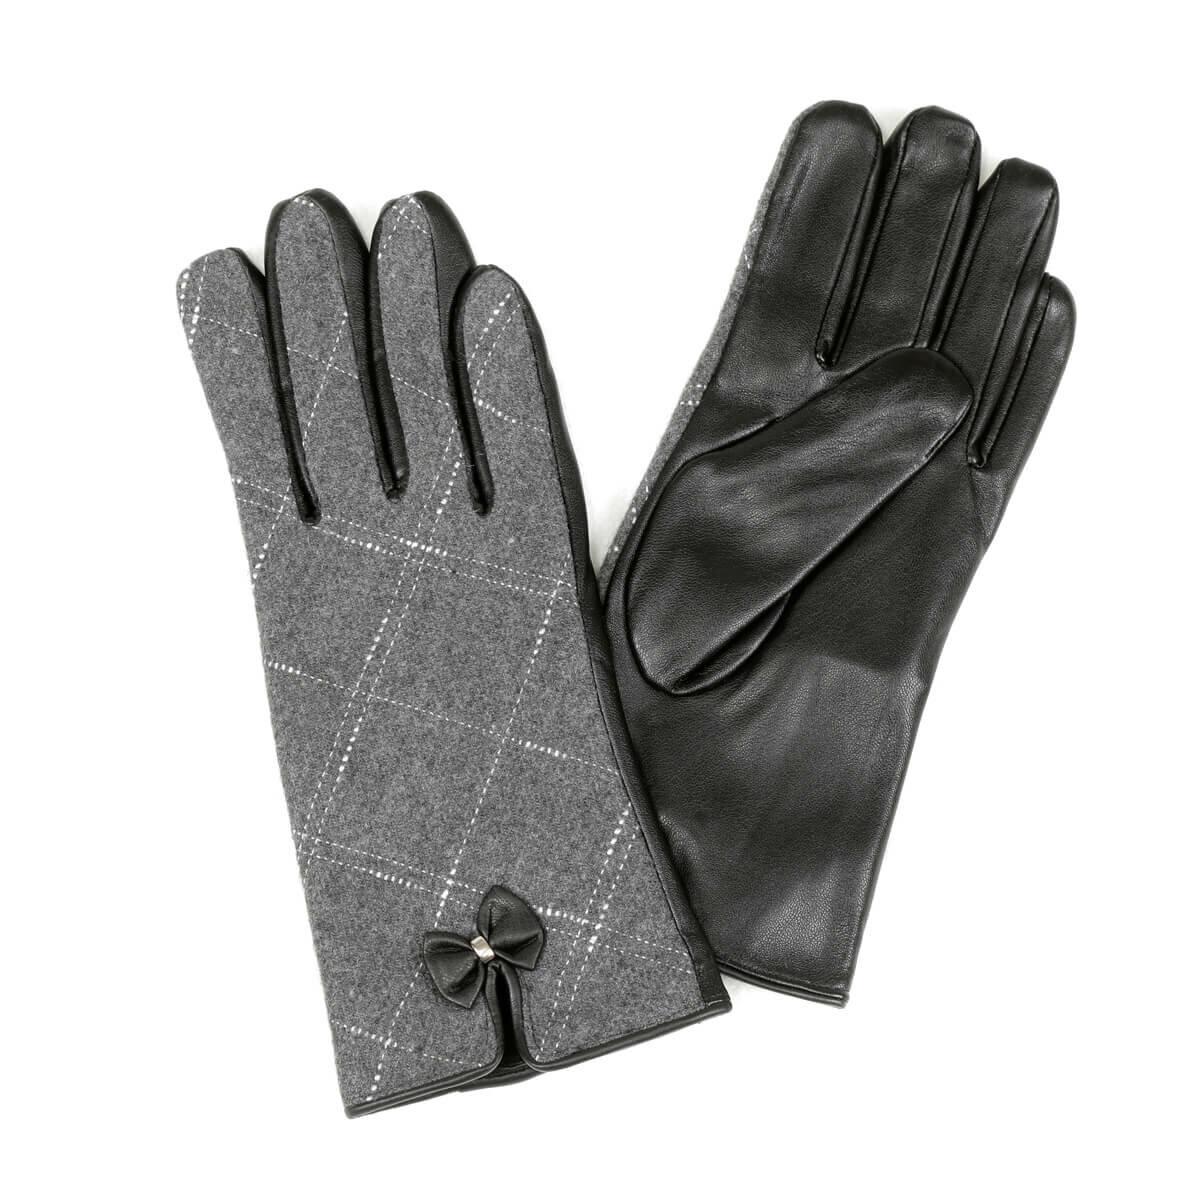 FLO ELD 11078 77Z Gray Women 'S Gloves BUTIGO